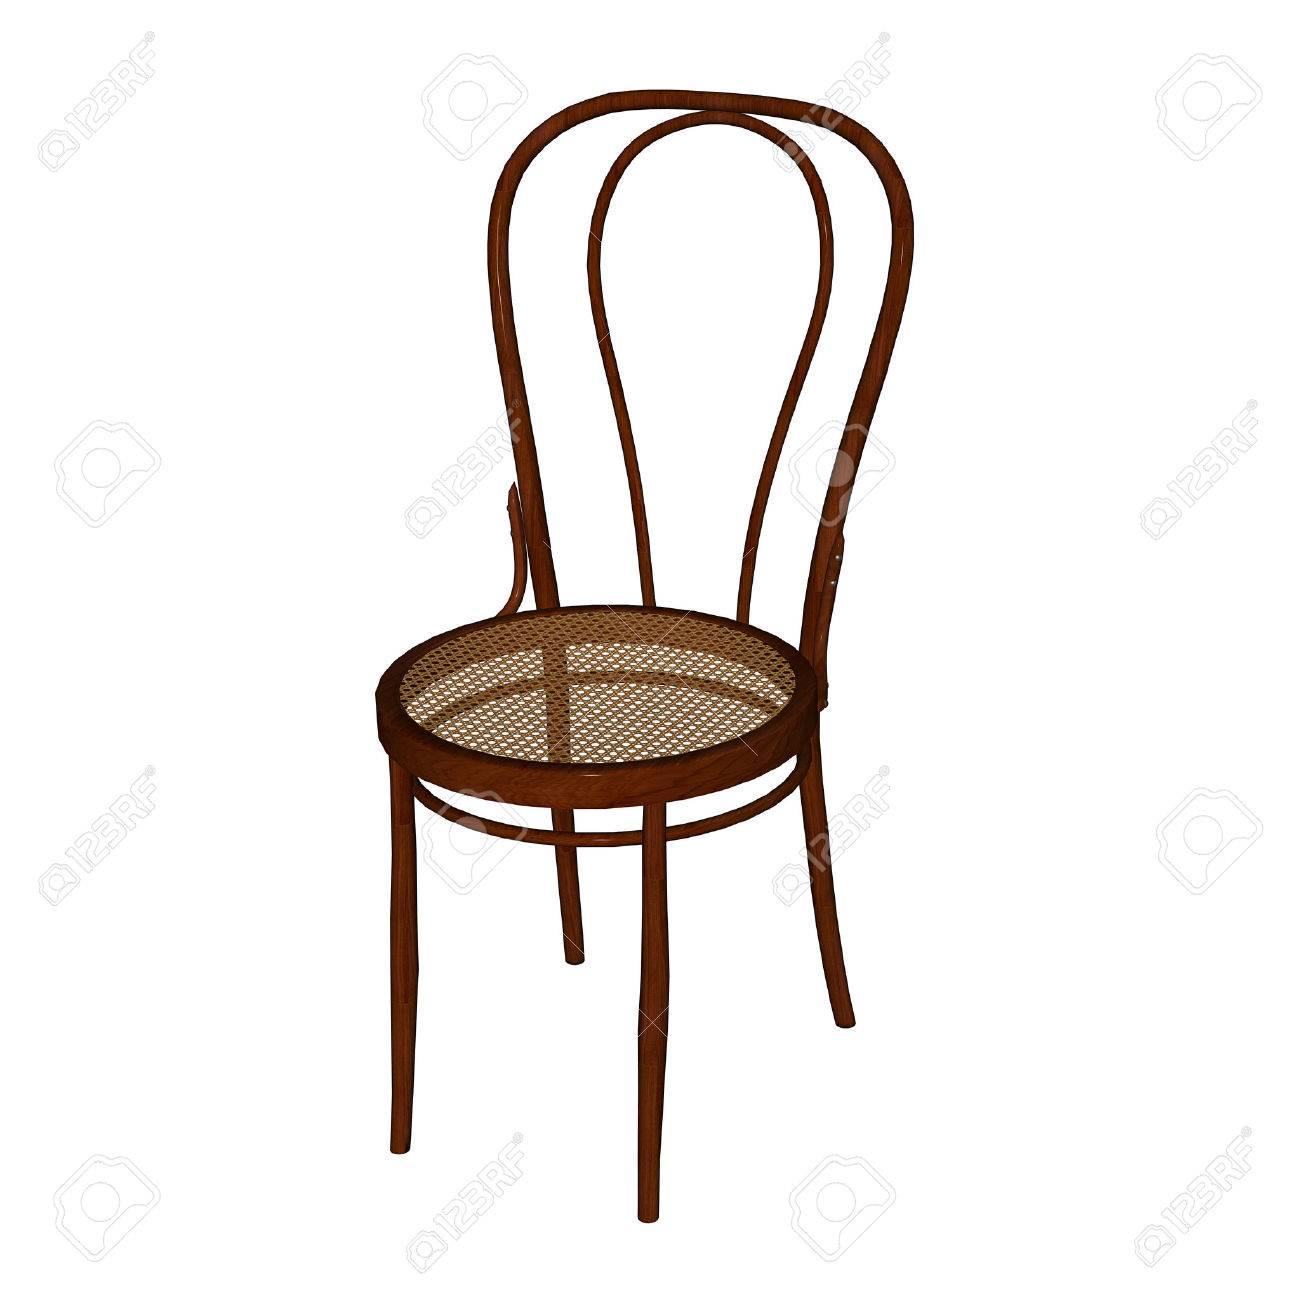 Sedie In Stile Thonet.Sedia In Stile Art Deco Con Thonet Vienna Caned Sede Il Rendering 3d